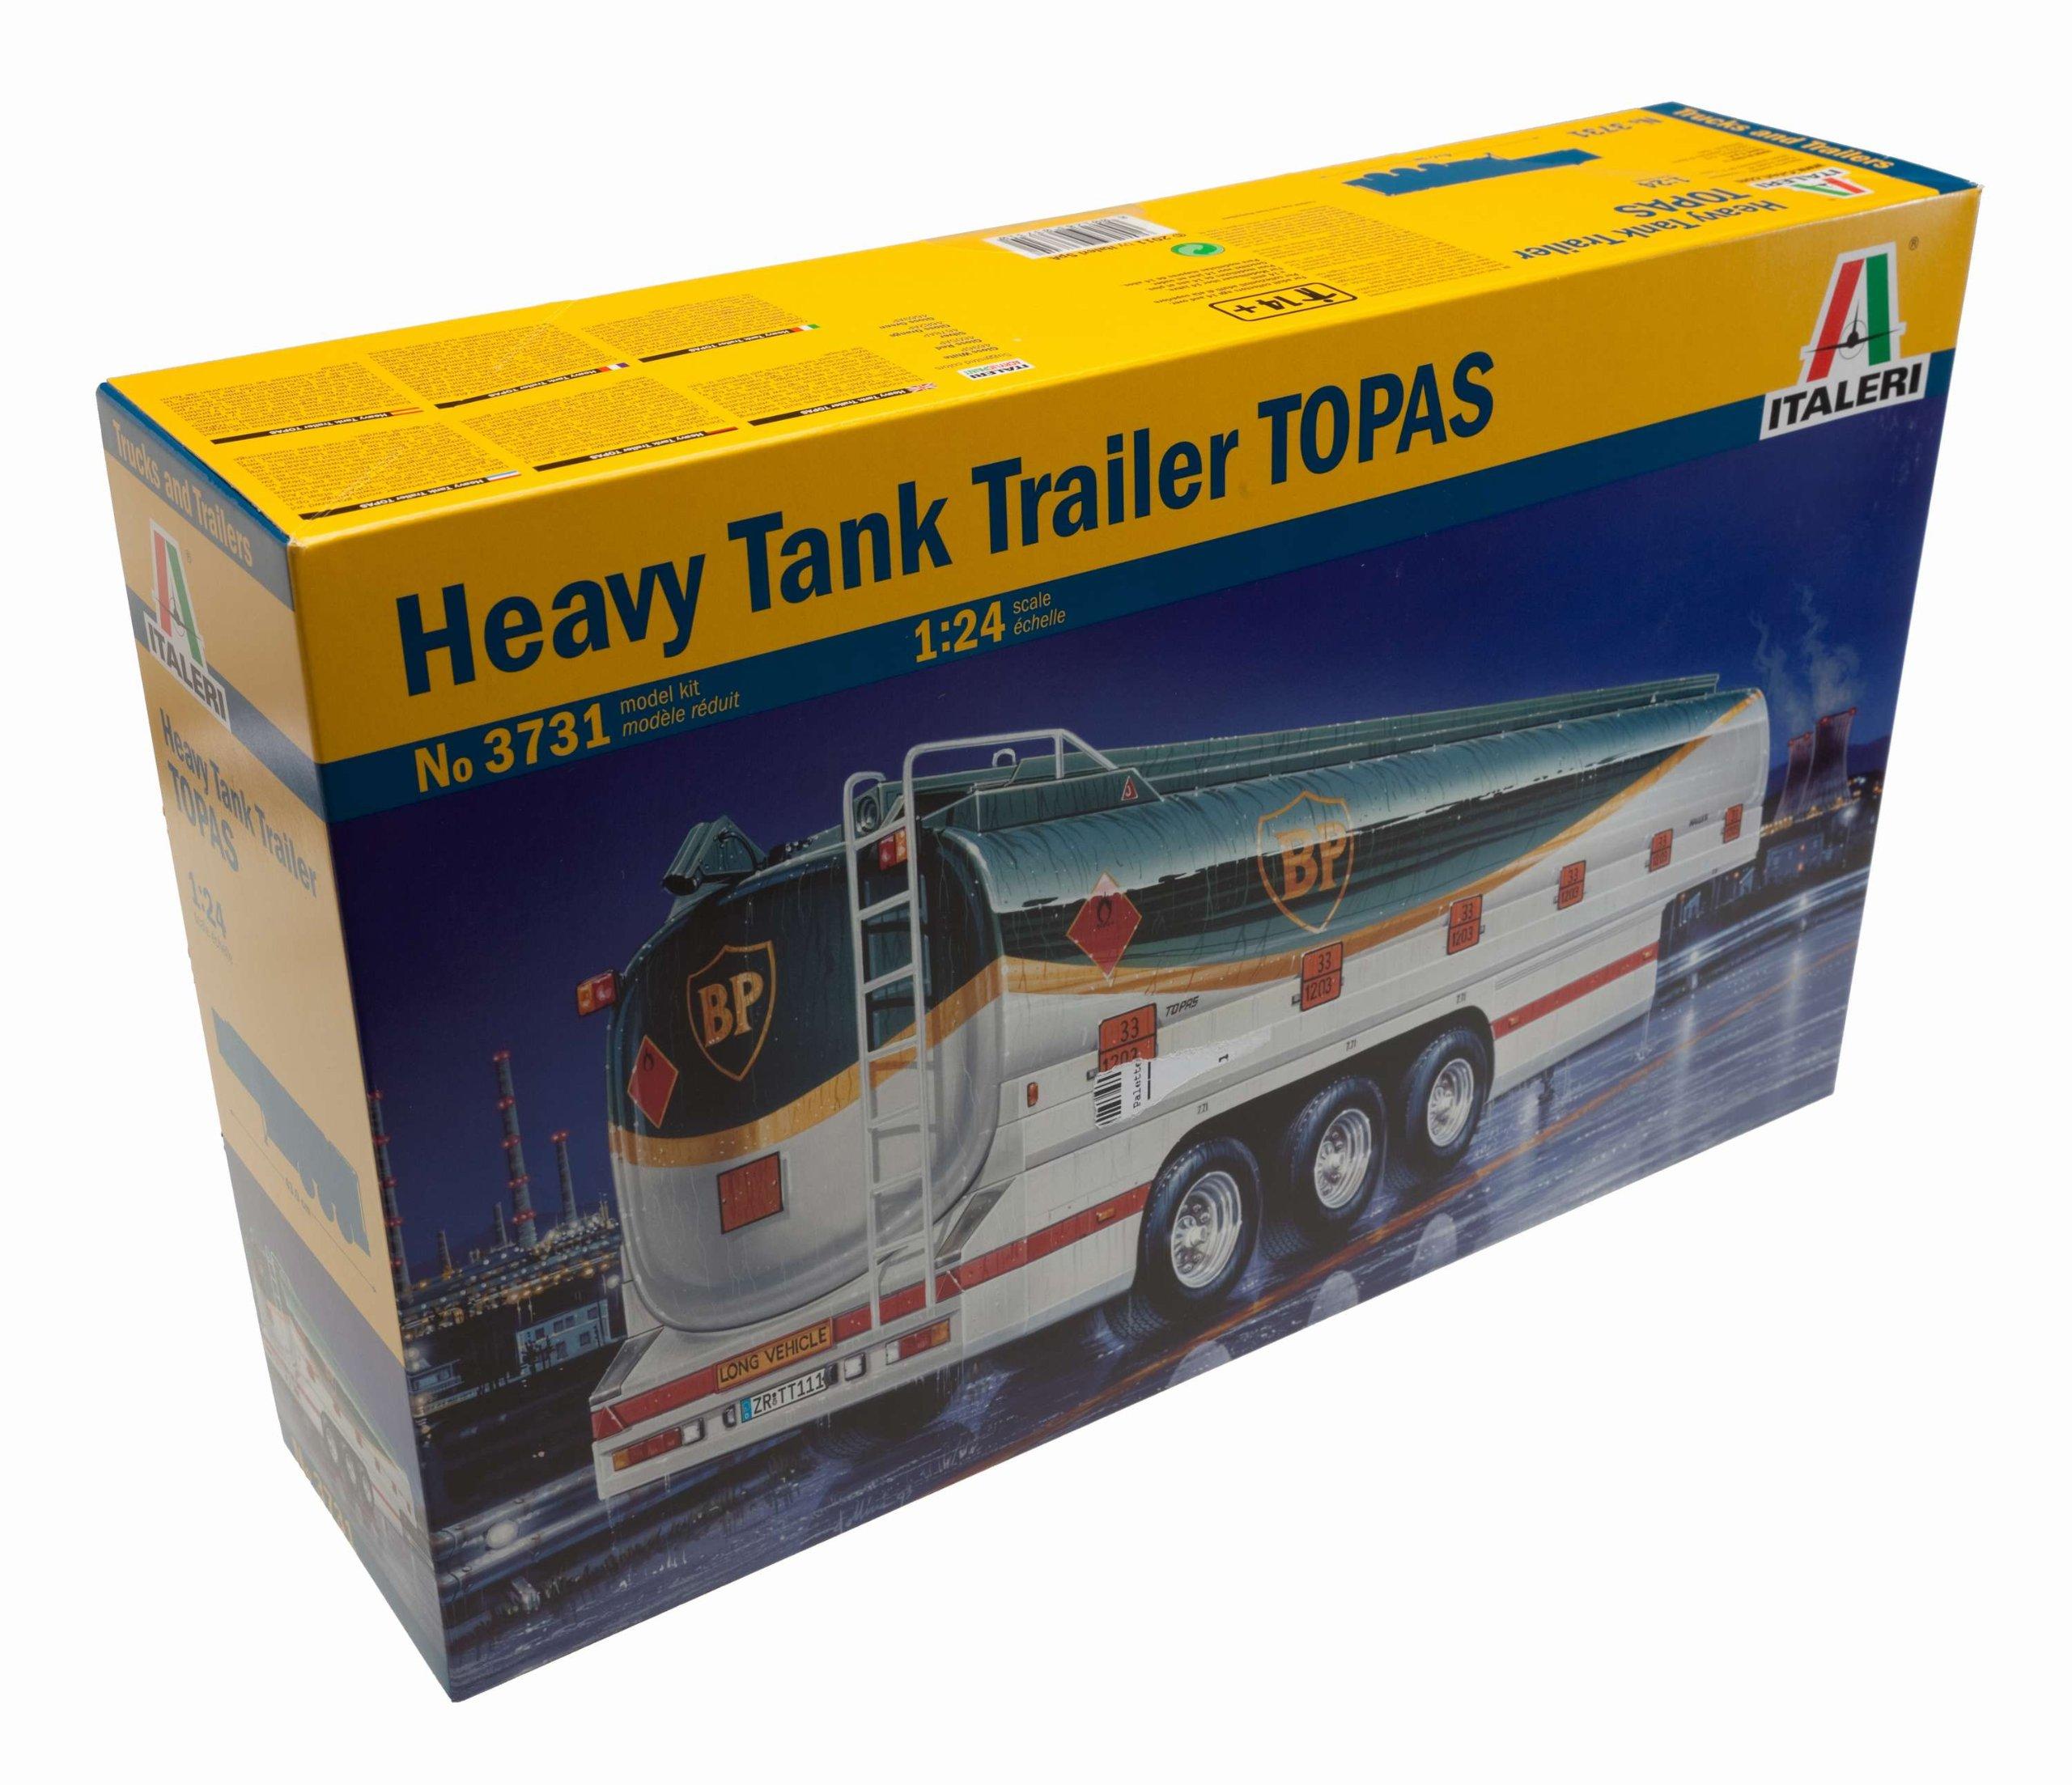 Italeri 510003731 -1:24 Topas Tank semi-Trailer